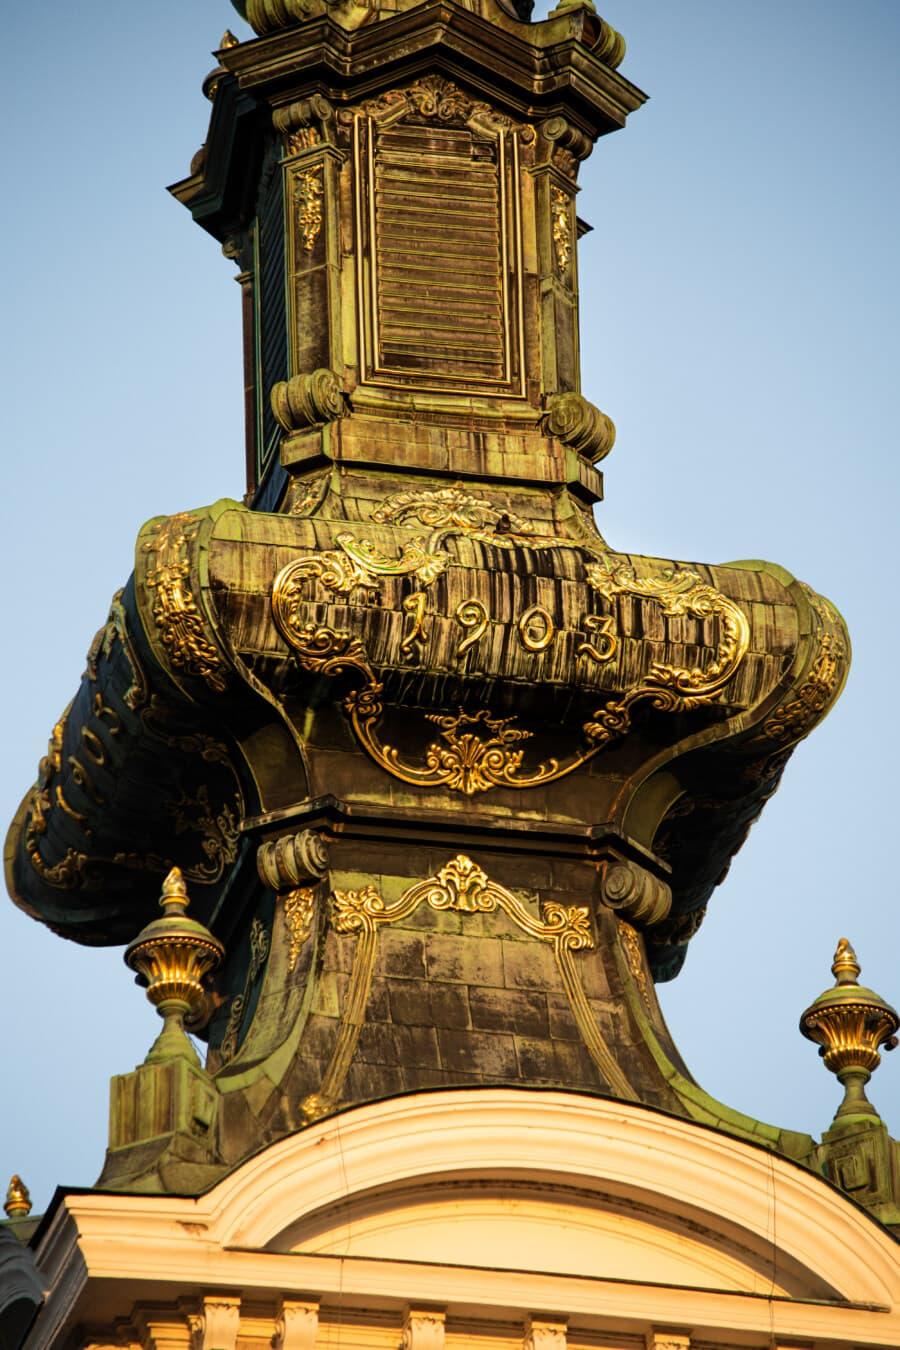 orthodoxe, Kirchturm, Stil, Dekoration, Barock, Arabeske, handgefertigte, Gold, Architektur, Skulptur